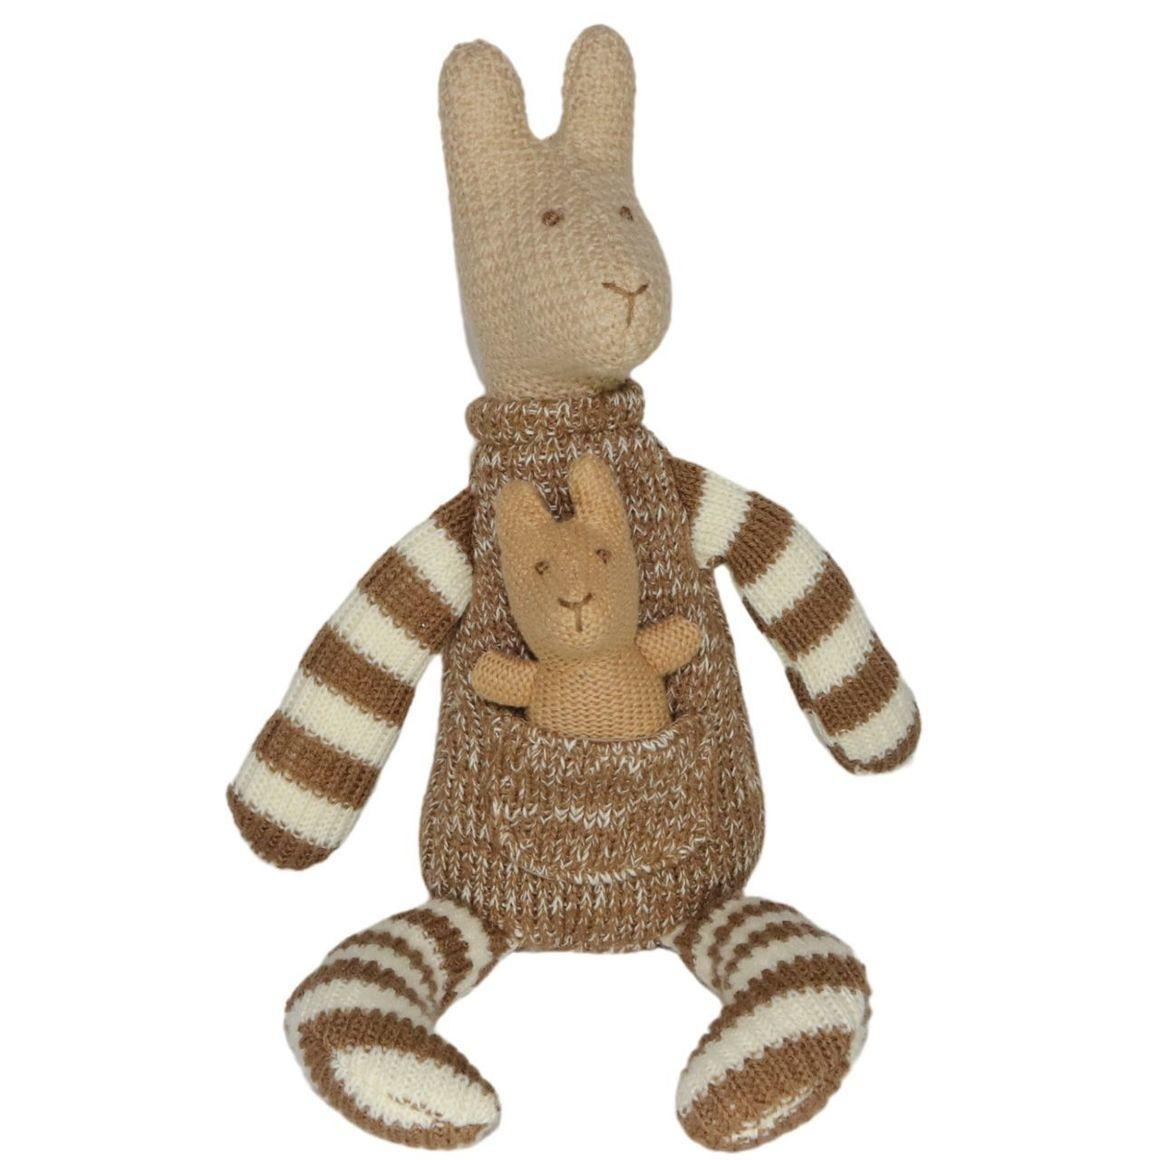 Plush Toy Kangaroo & Baby Joey - Brown/White Stripes    Trada Marketplace